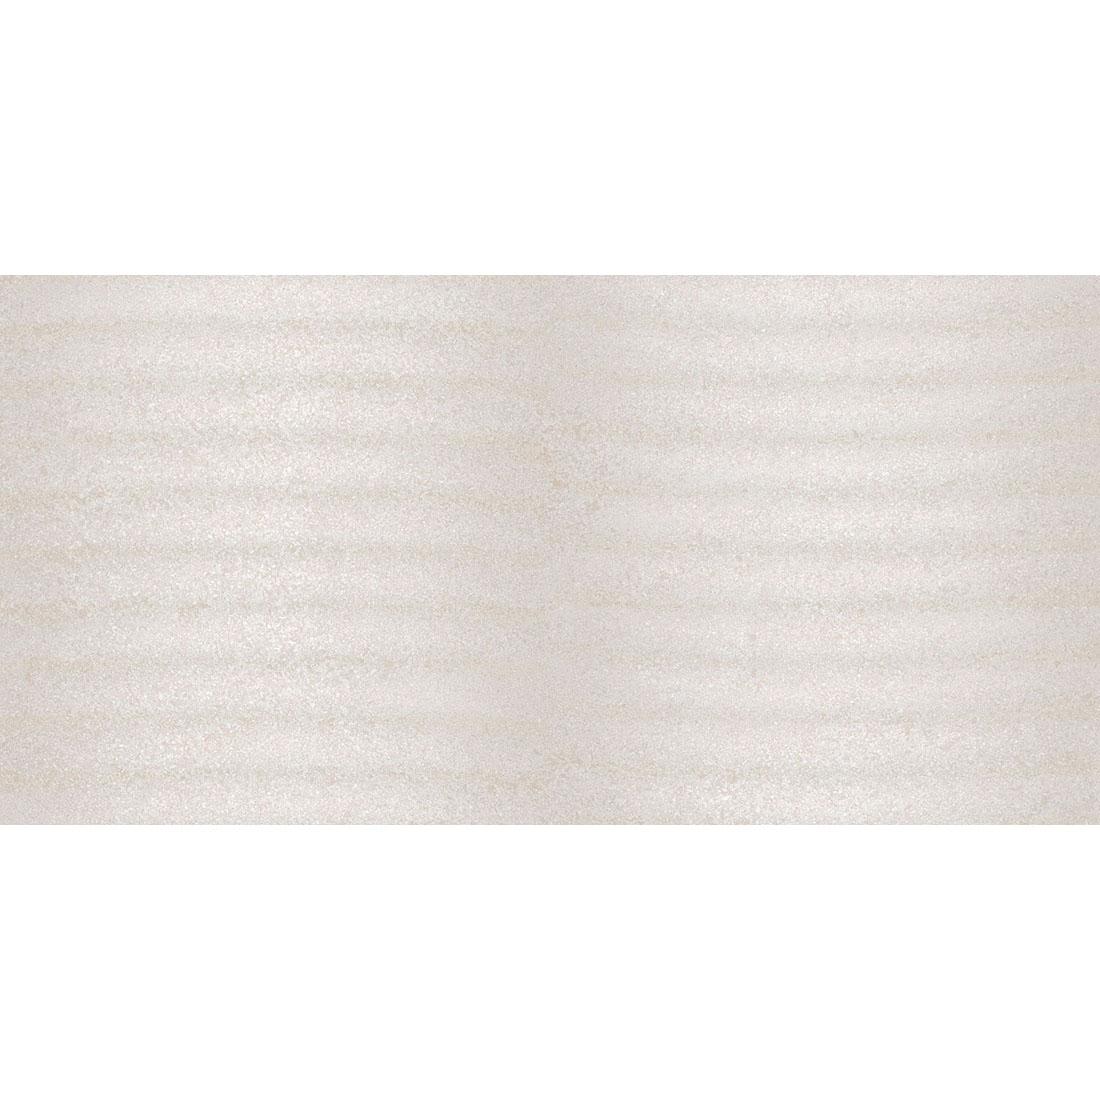 Triana Night 30x60 Grey Gloss 1